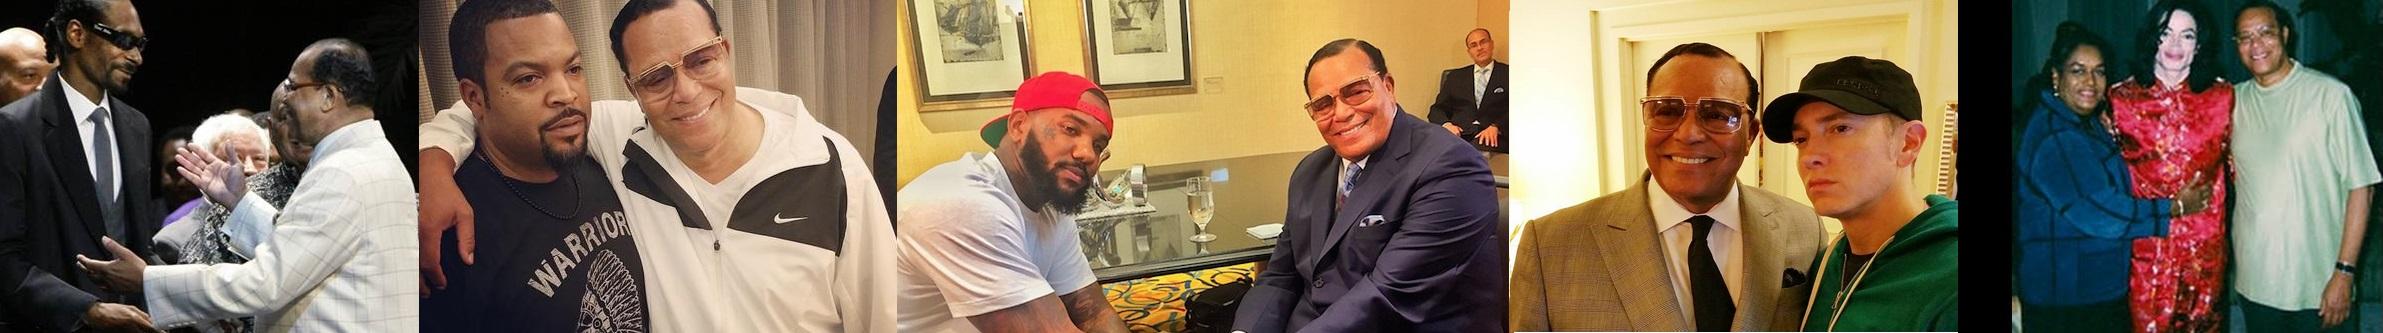 Snoop Dogg; Ice Cube; The Game; Eminem; Michael Jackson; Khadijah Farrakhan et Louis Farrakhan